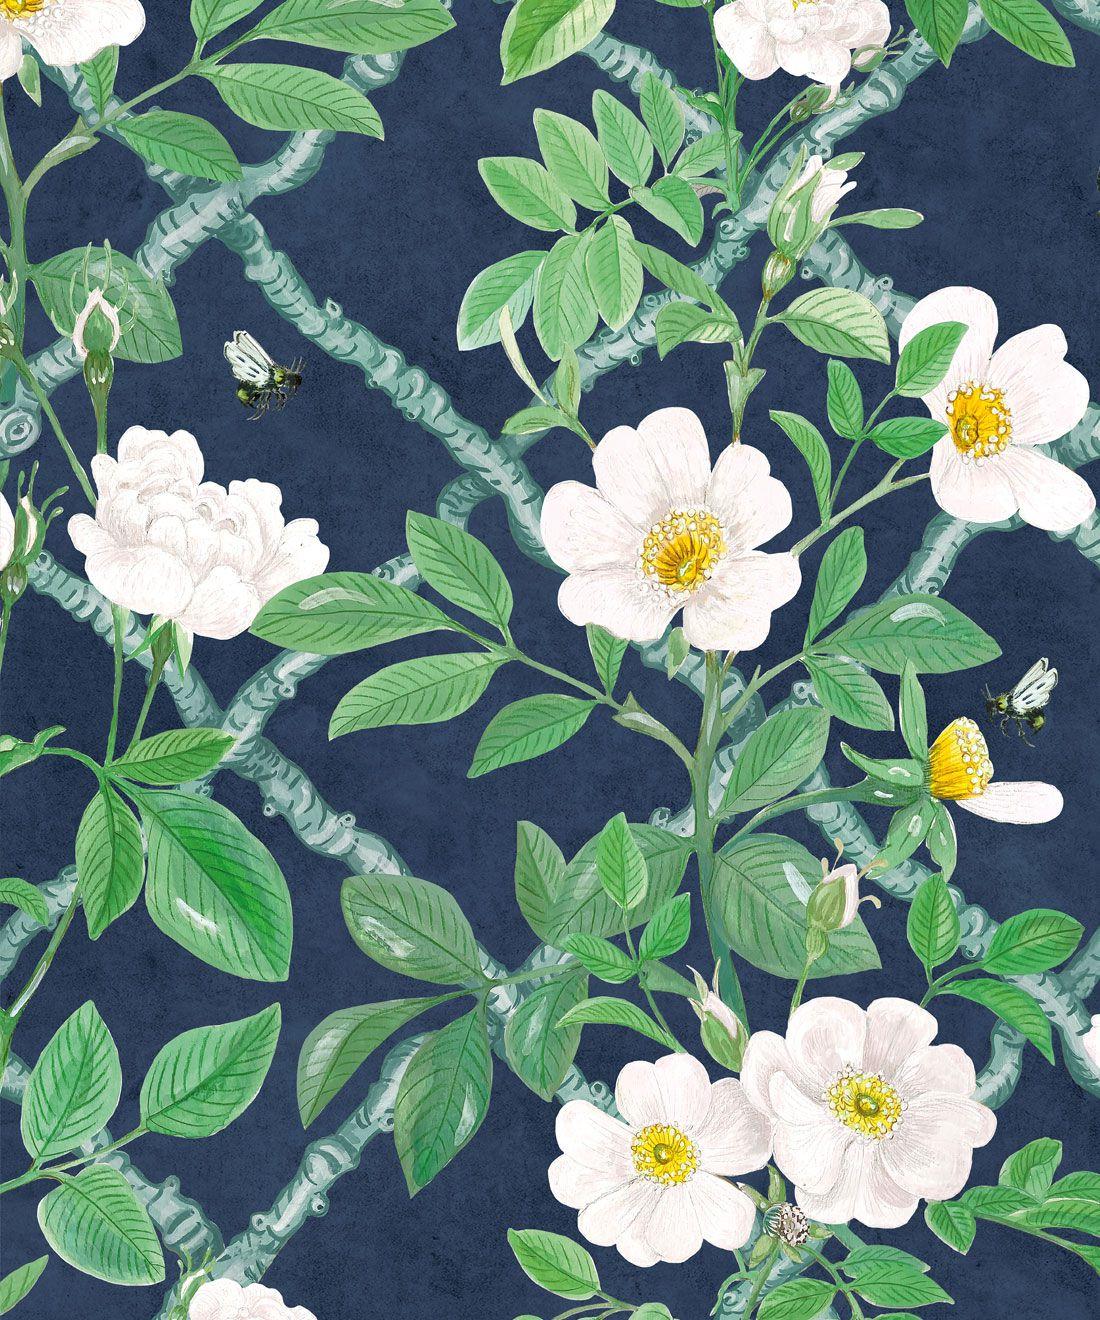 Treilage Wallpaper • Floral Wallpaper • Royal Blue • Swatch